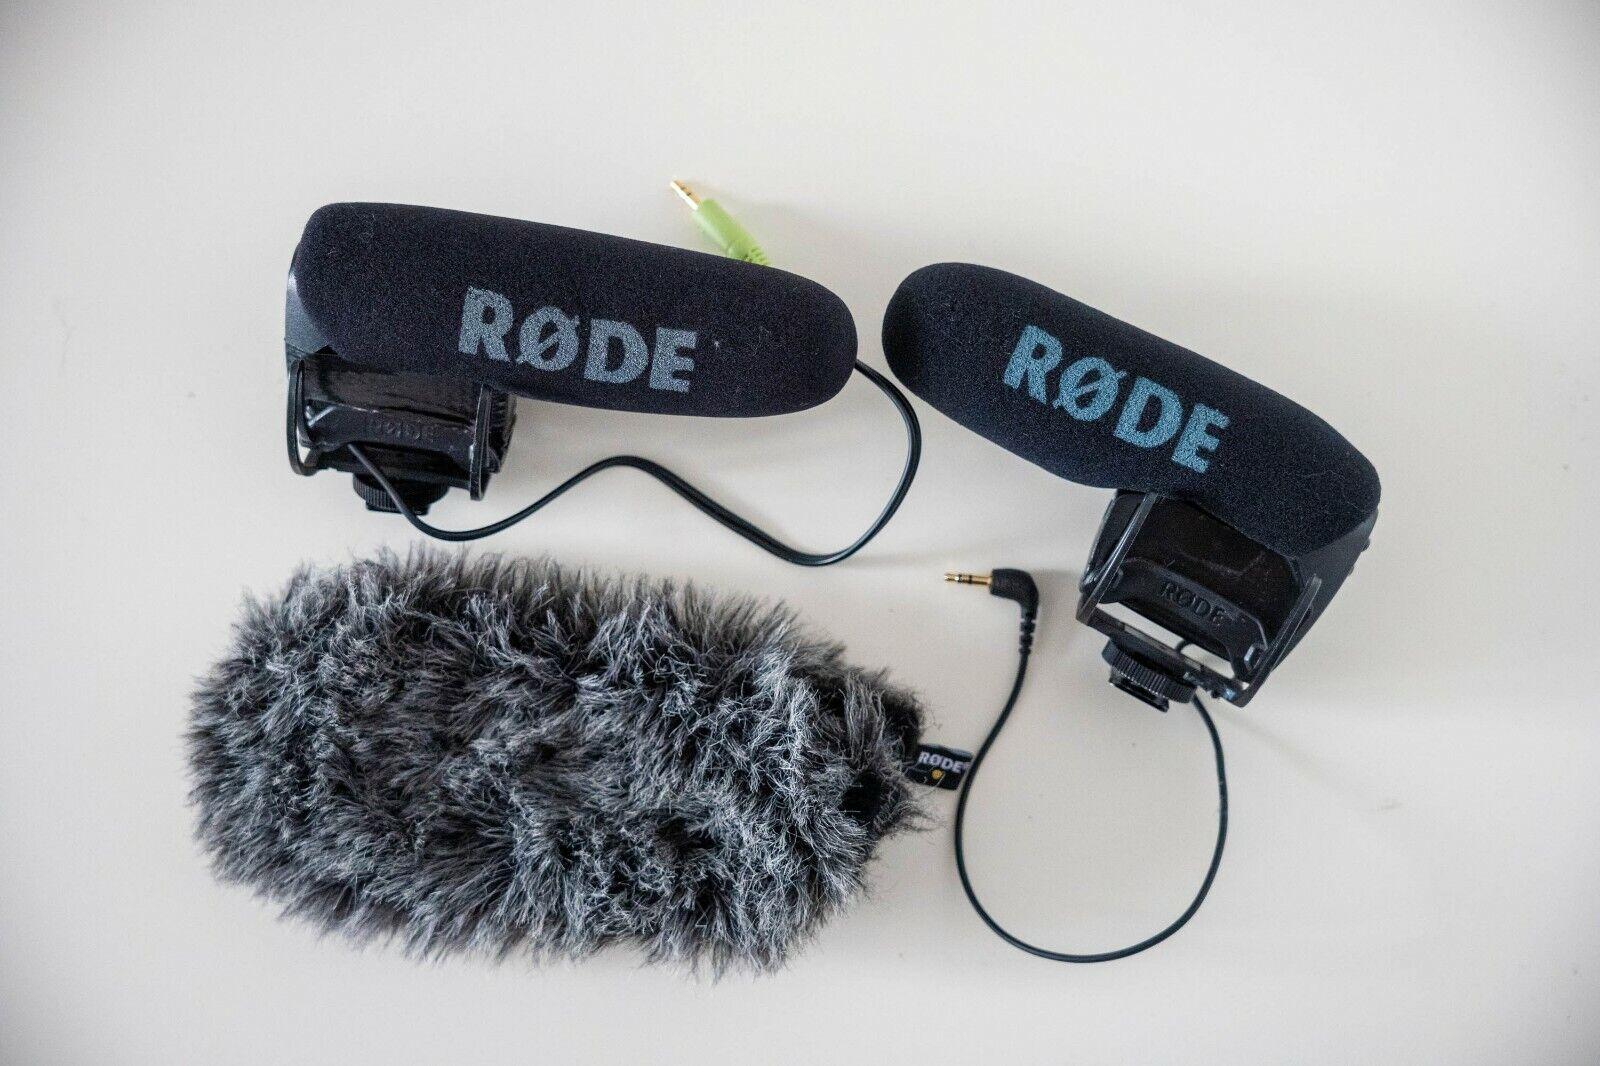 RODE VideoMic Pro shotgun microphones, pair, working with minor repairs